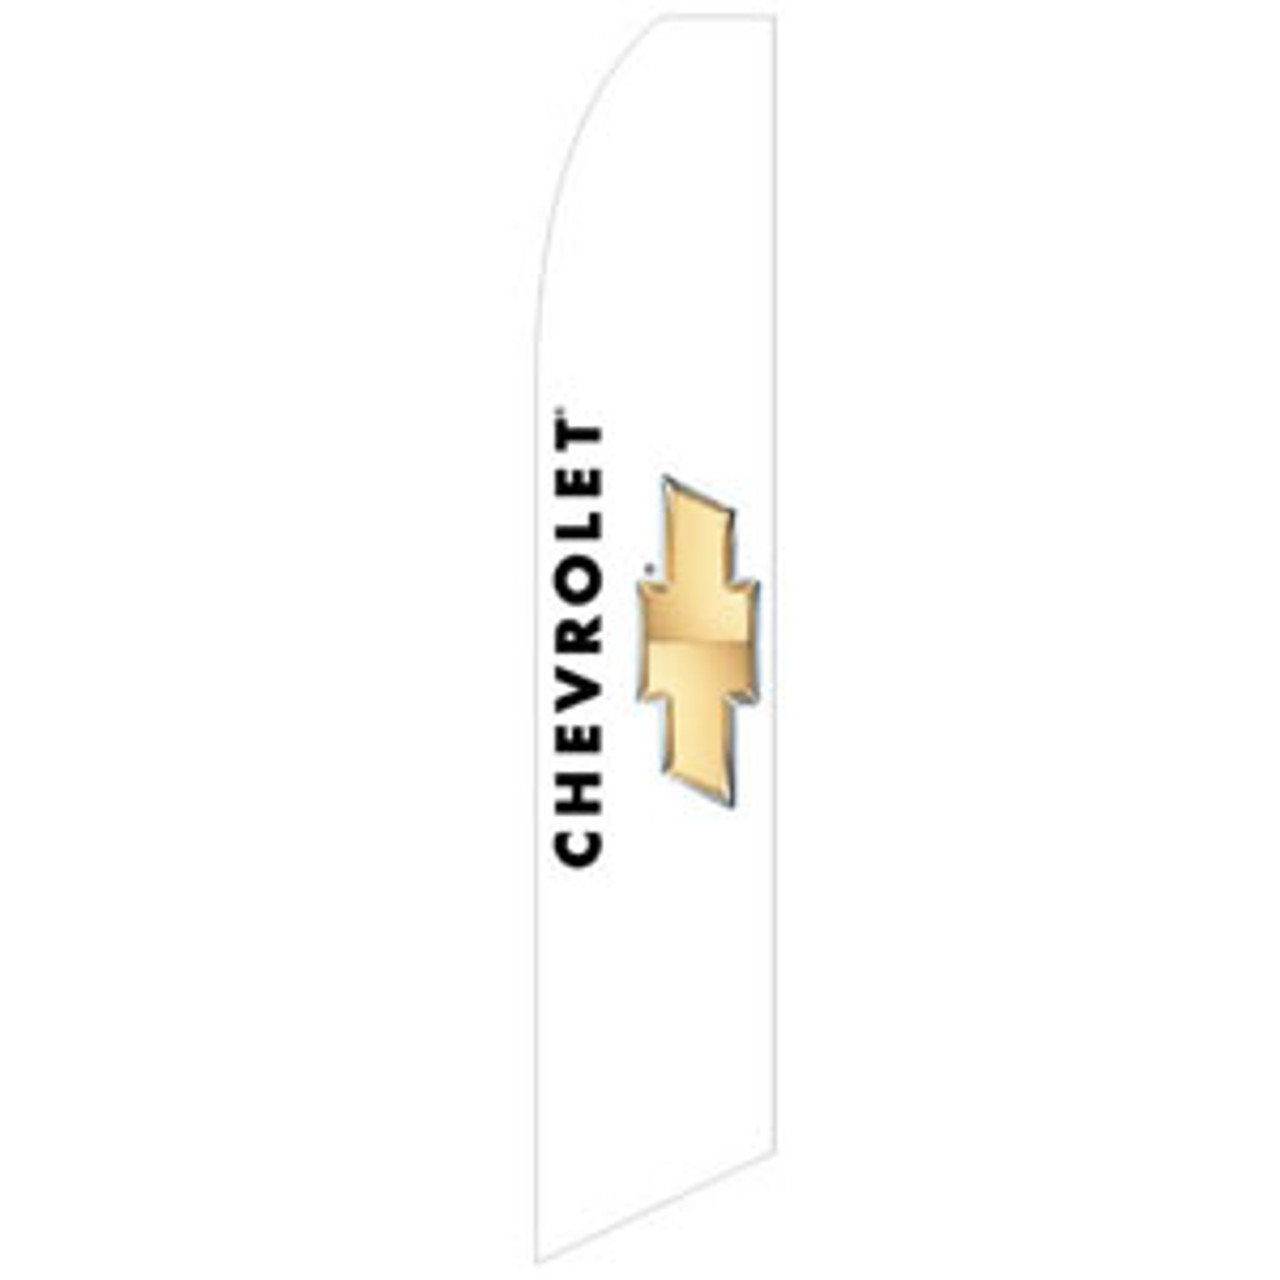 Chevrolet Dealership Feather Flag White